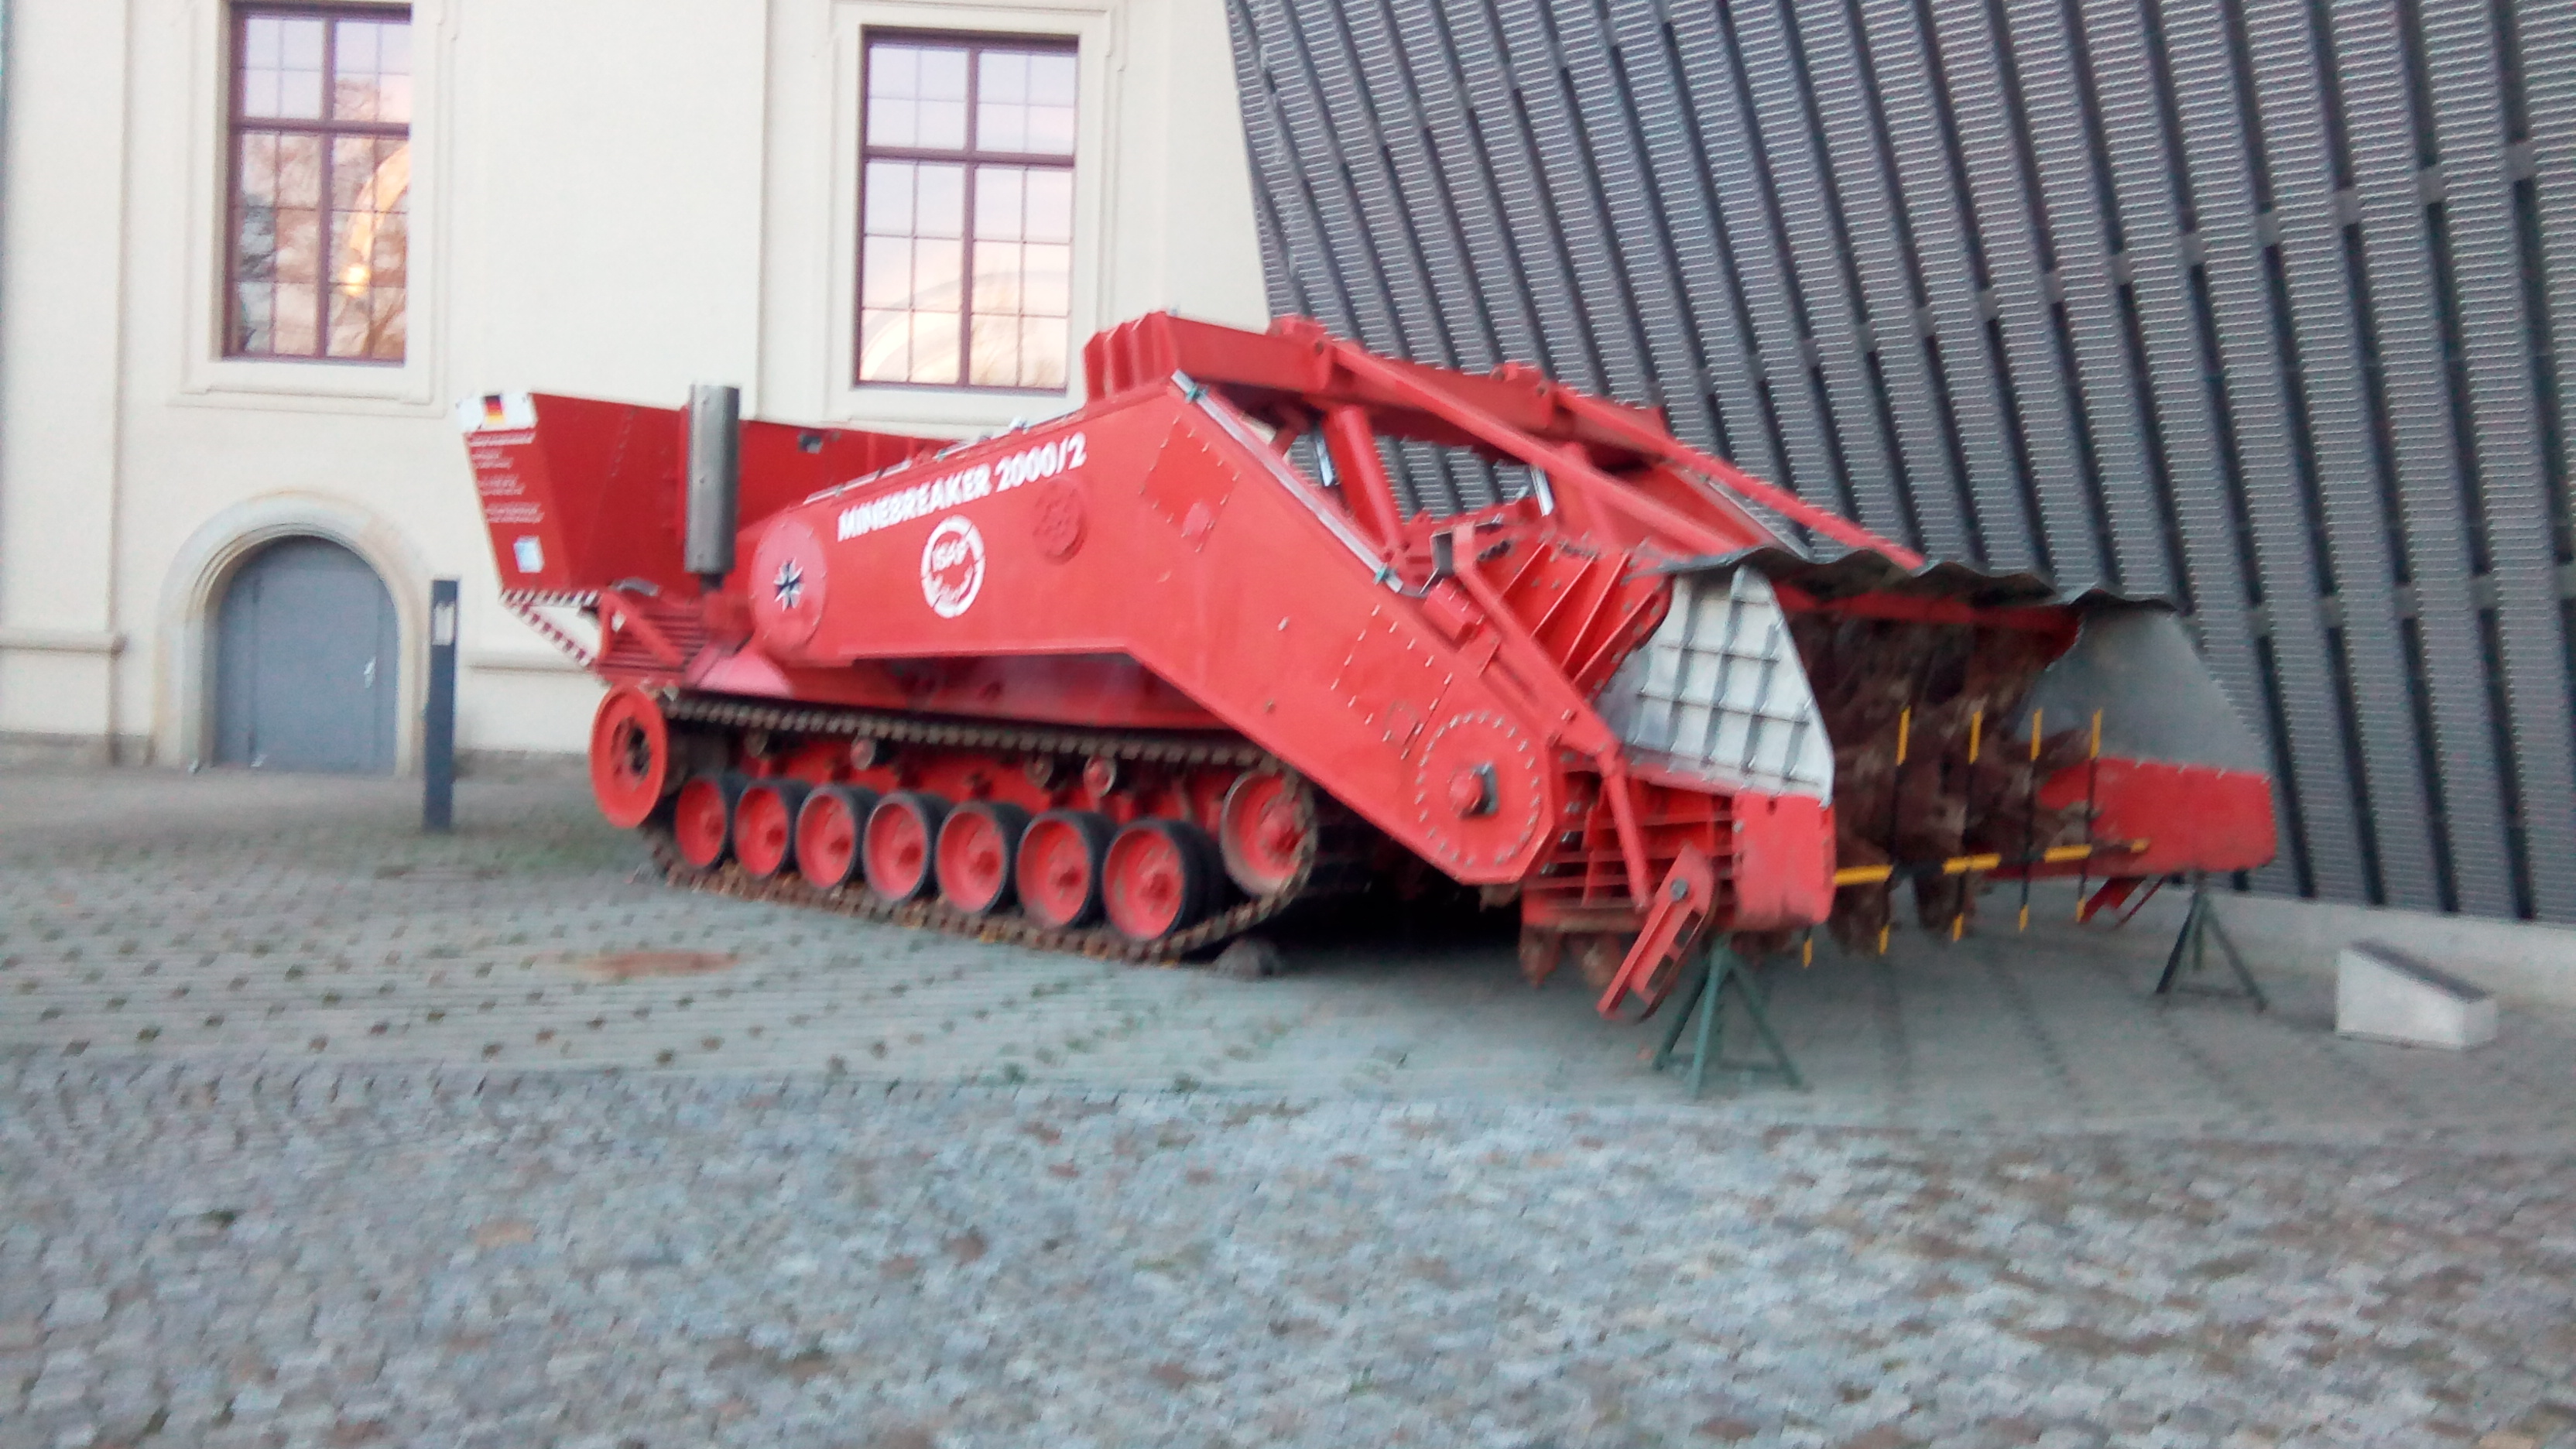 war-museum-1-anti-mining-heavy-vehicle